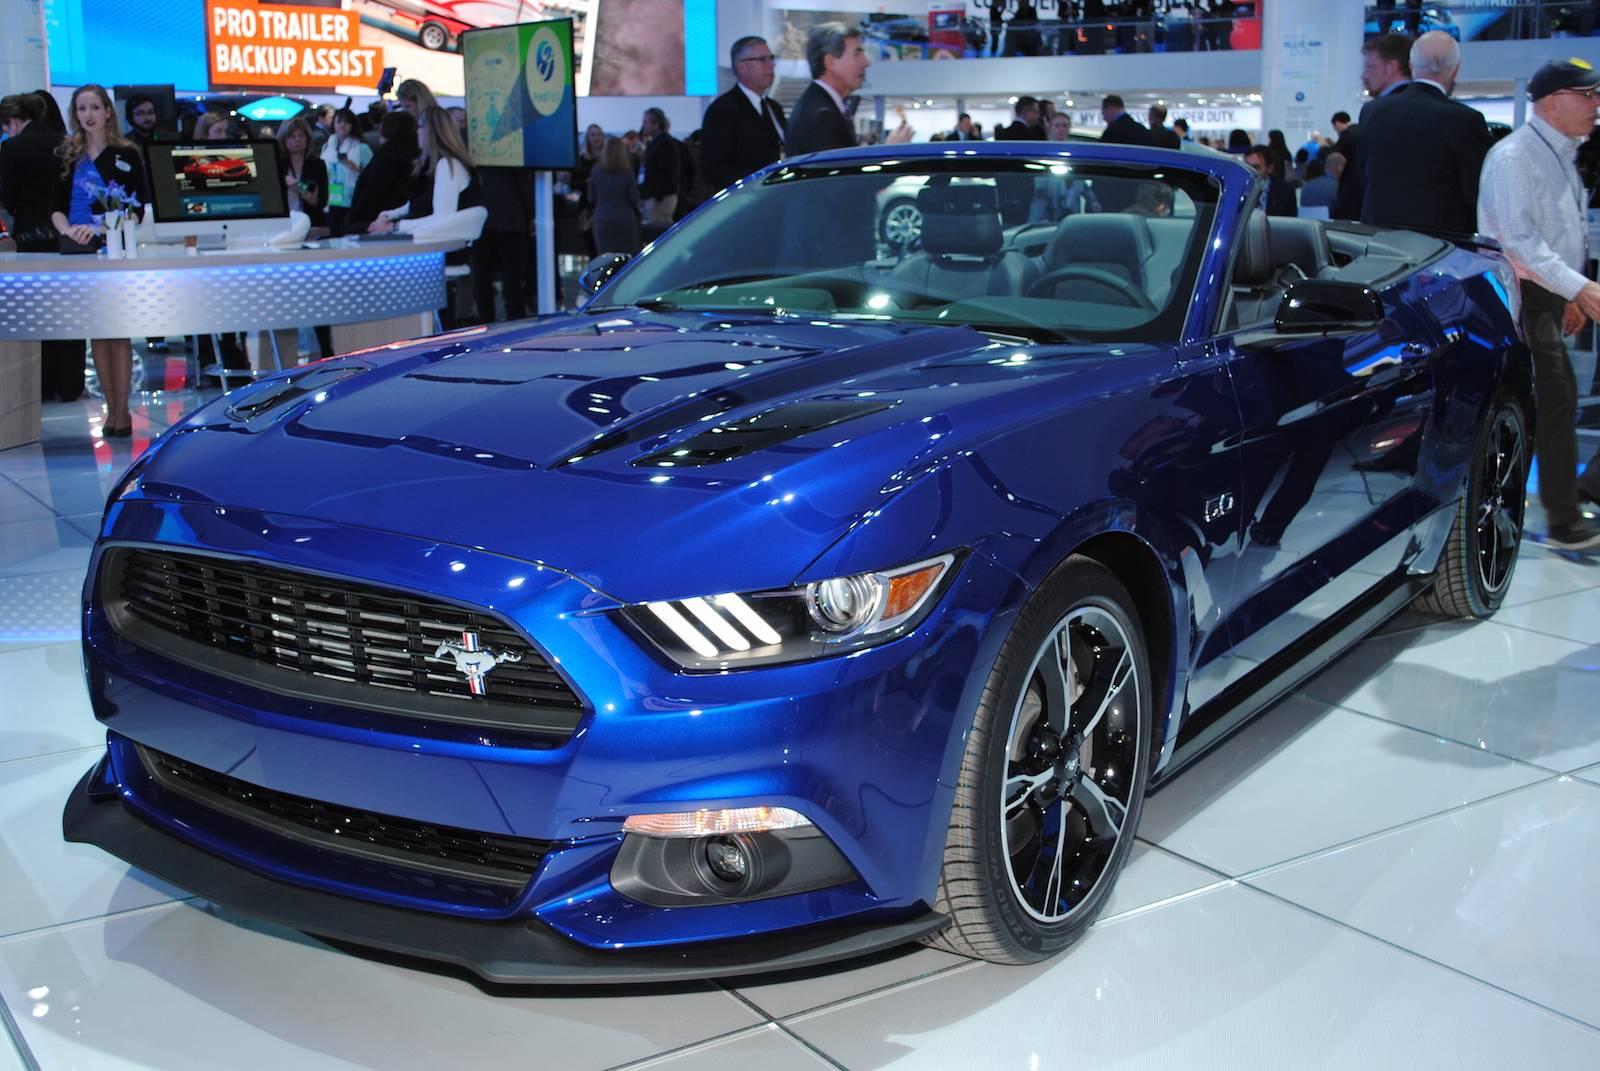 Detroit 2016: Ford Mustang GT California Special - GTspirit